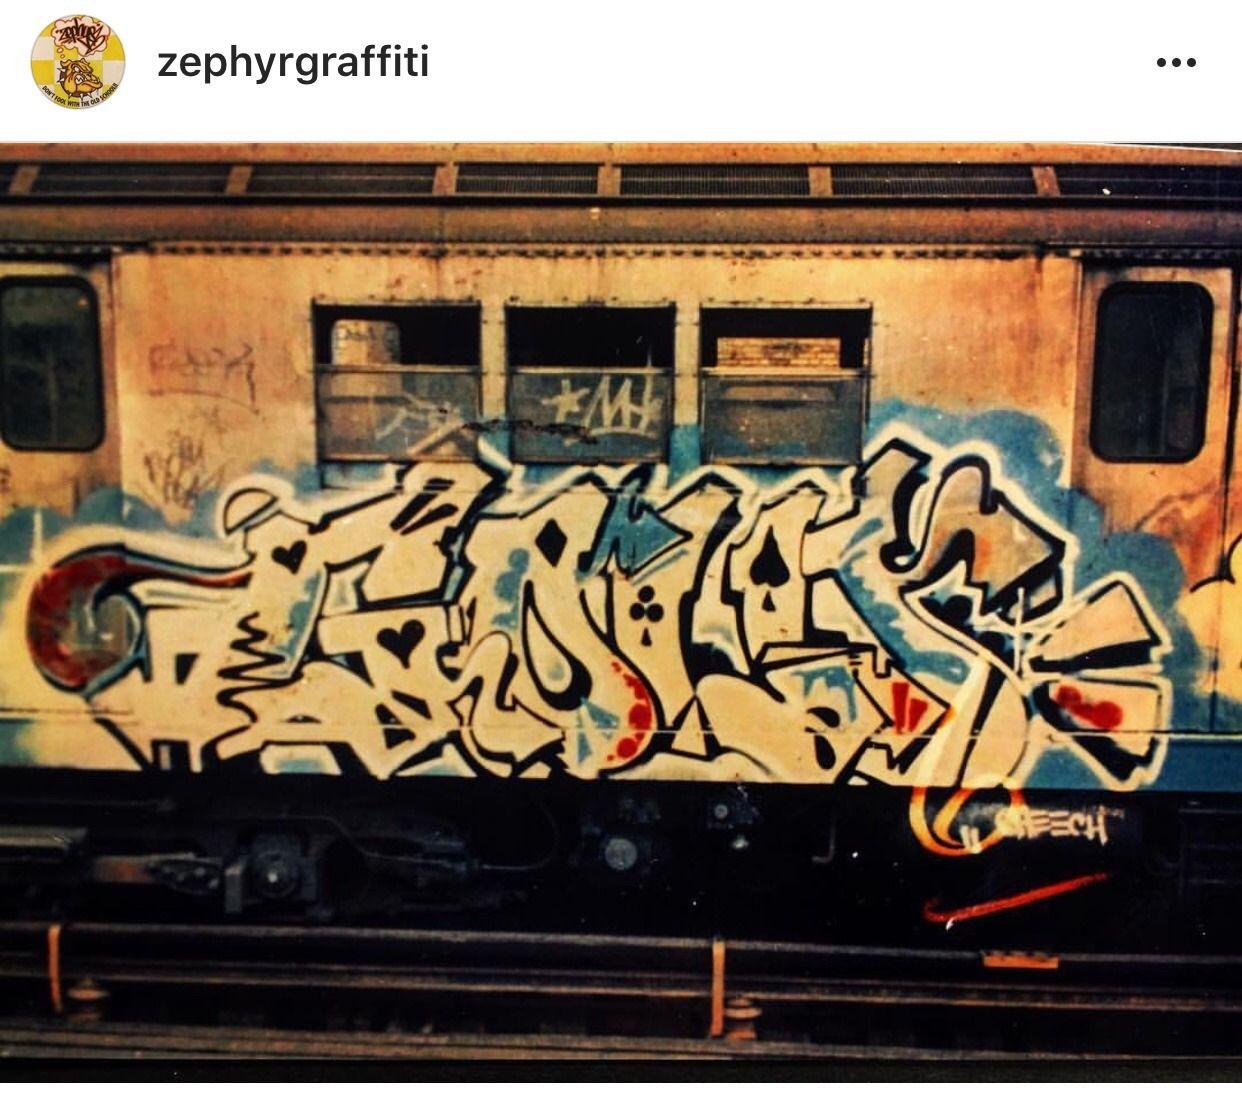 Nyc subway graffiti 1970s mid 1990s gold zephyr